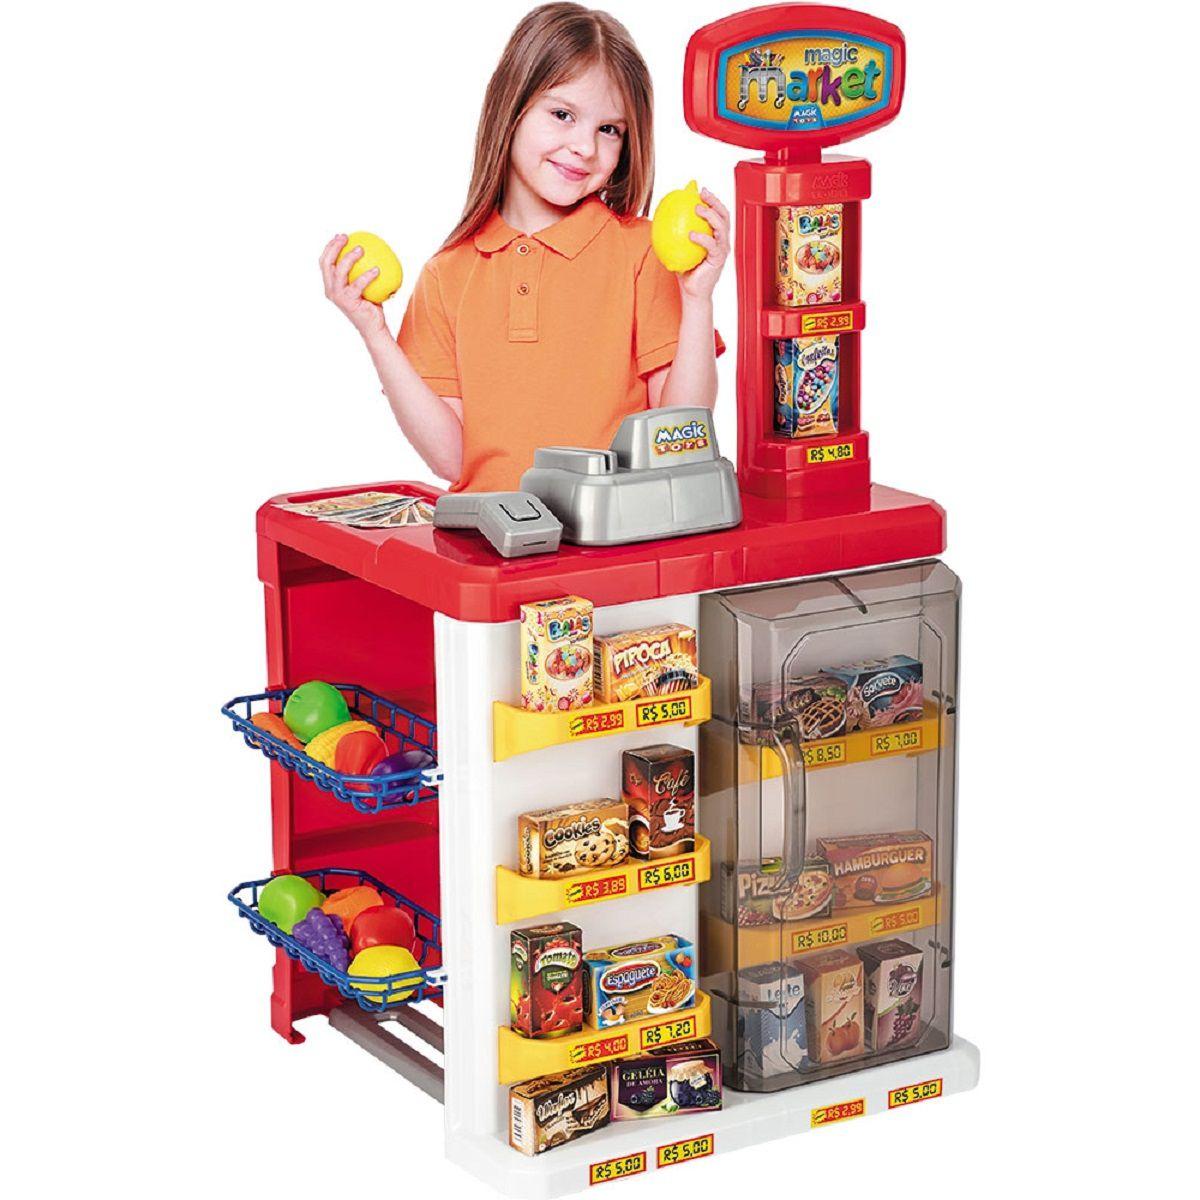 Brinquedo de Faz de Conta Magic Market - Vermelho - Magic Toys